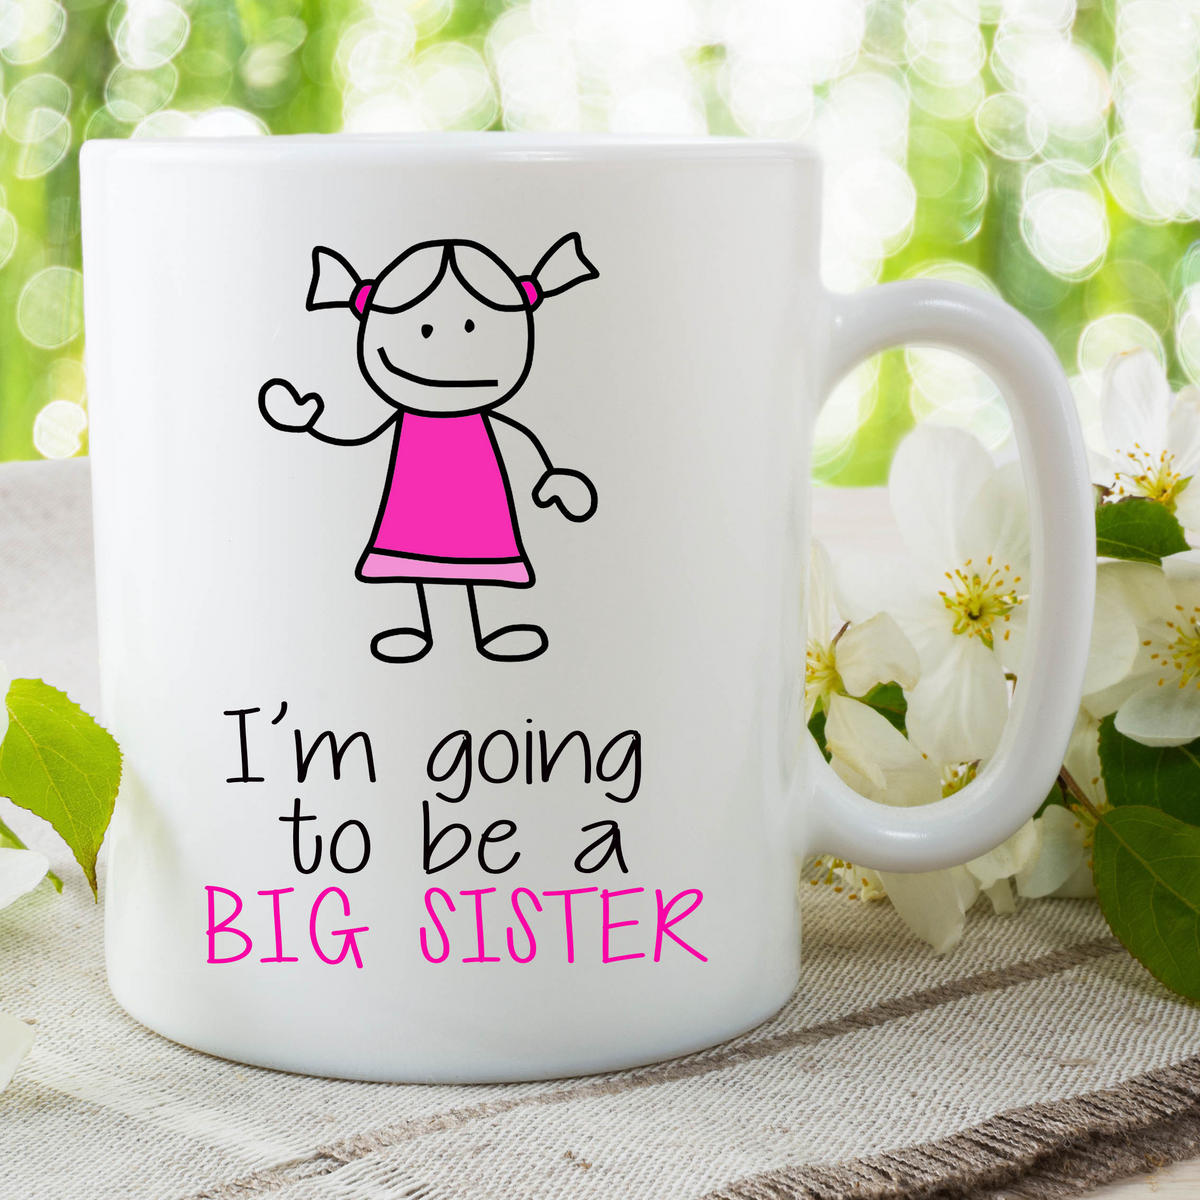 I'm Going To Be A Big Sister Mug Gift For Daughter Surprise Baby Gift WSDMUG660